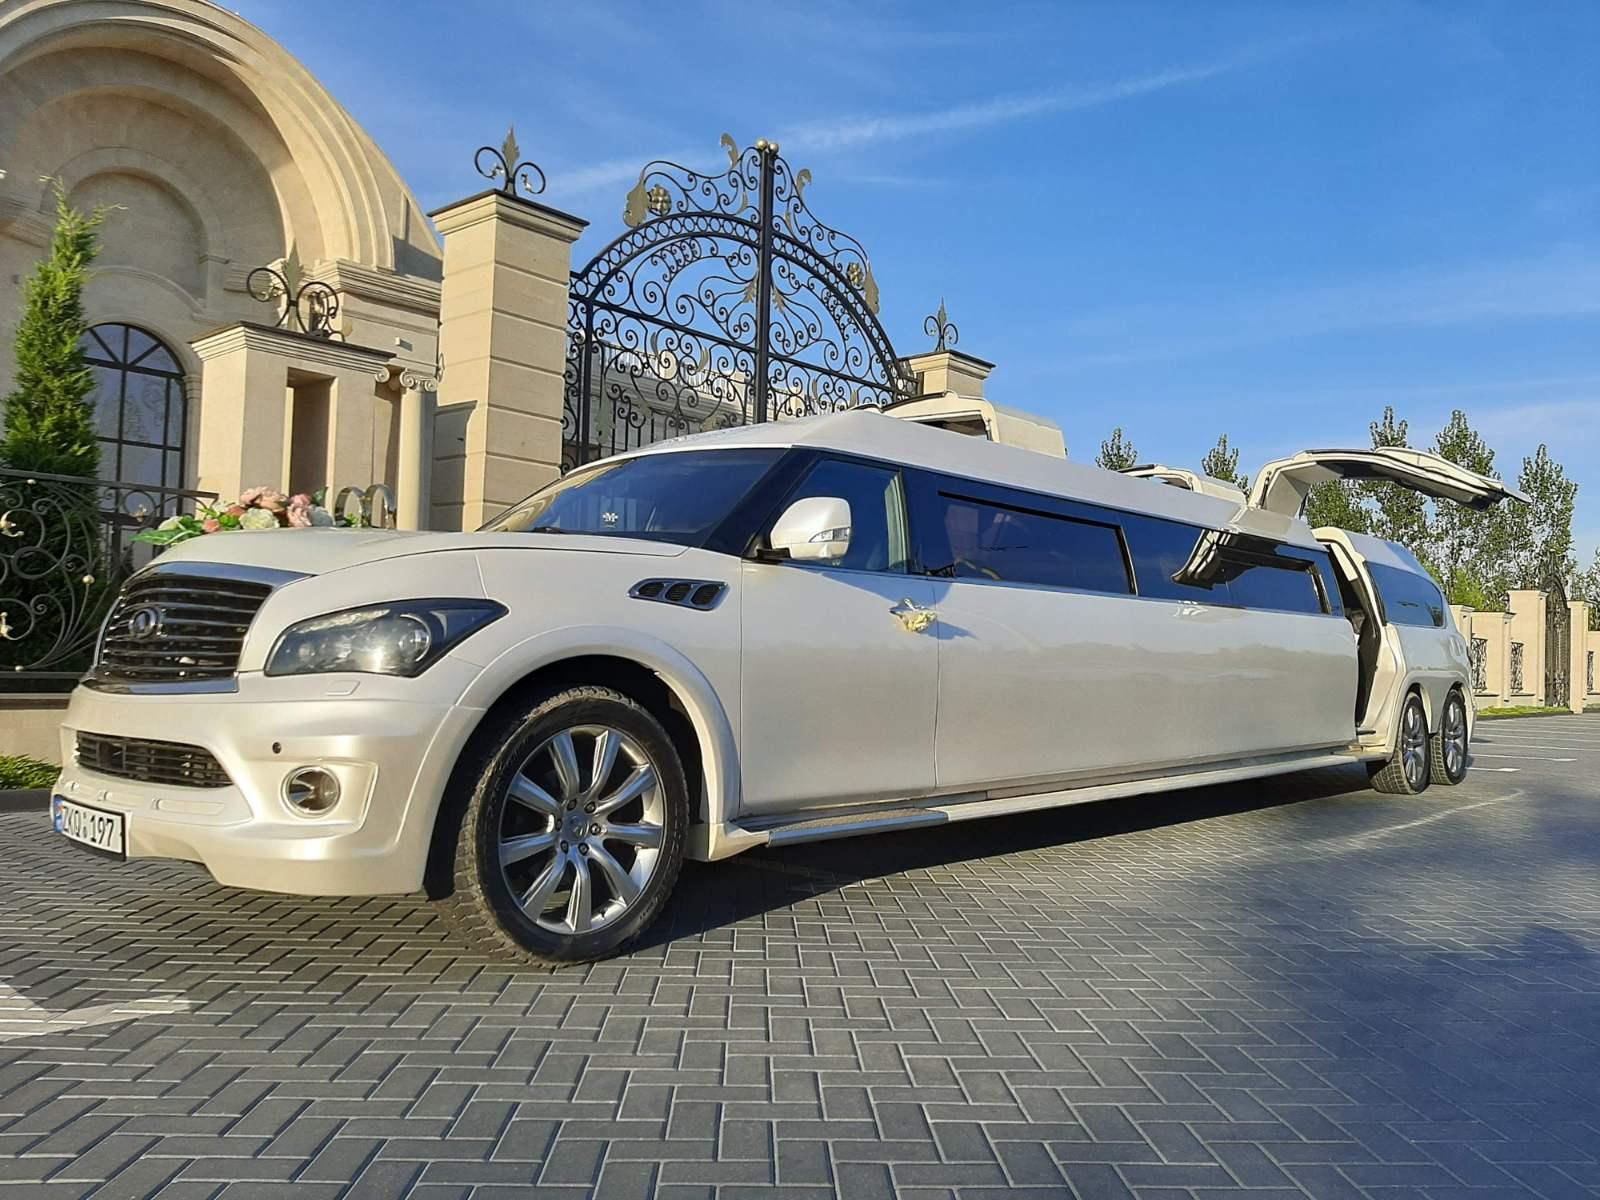 Inchiriere limuzine Chisinau